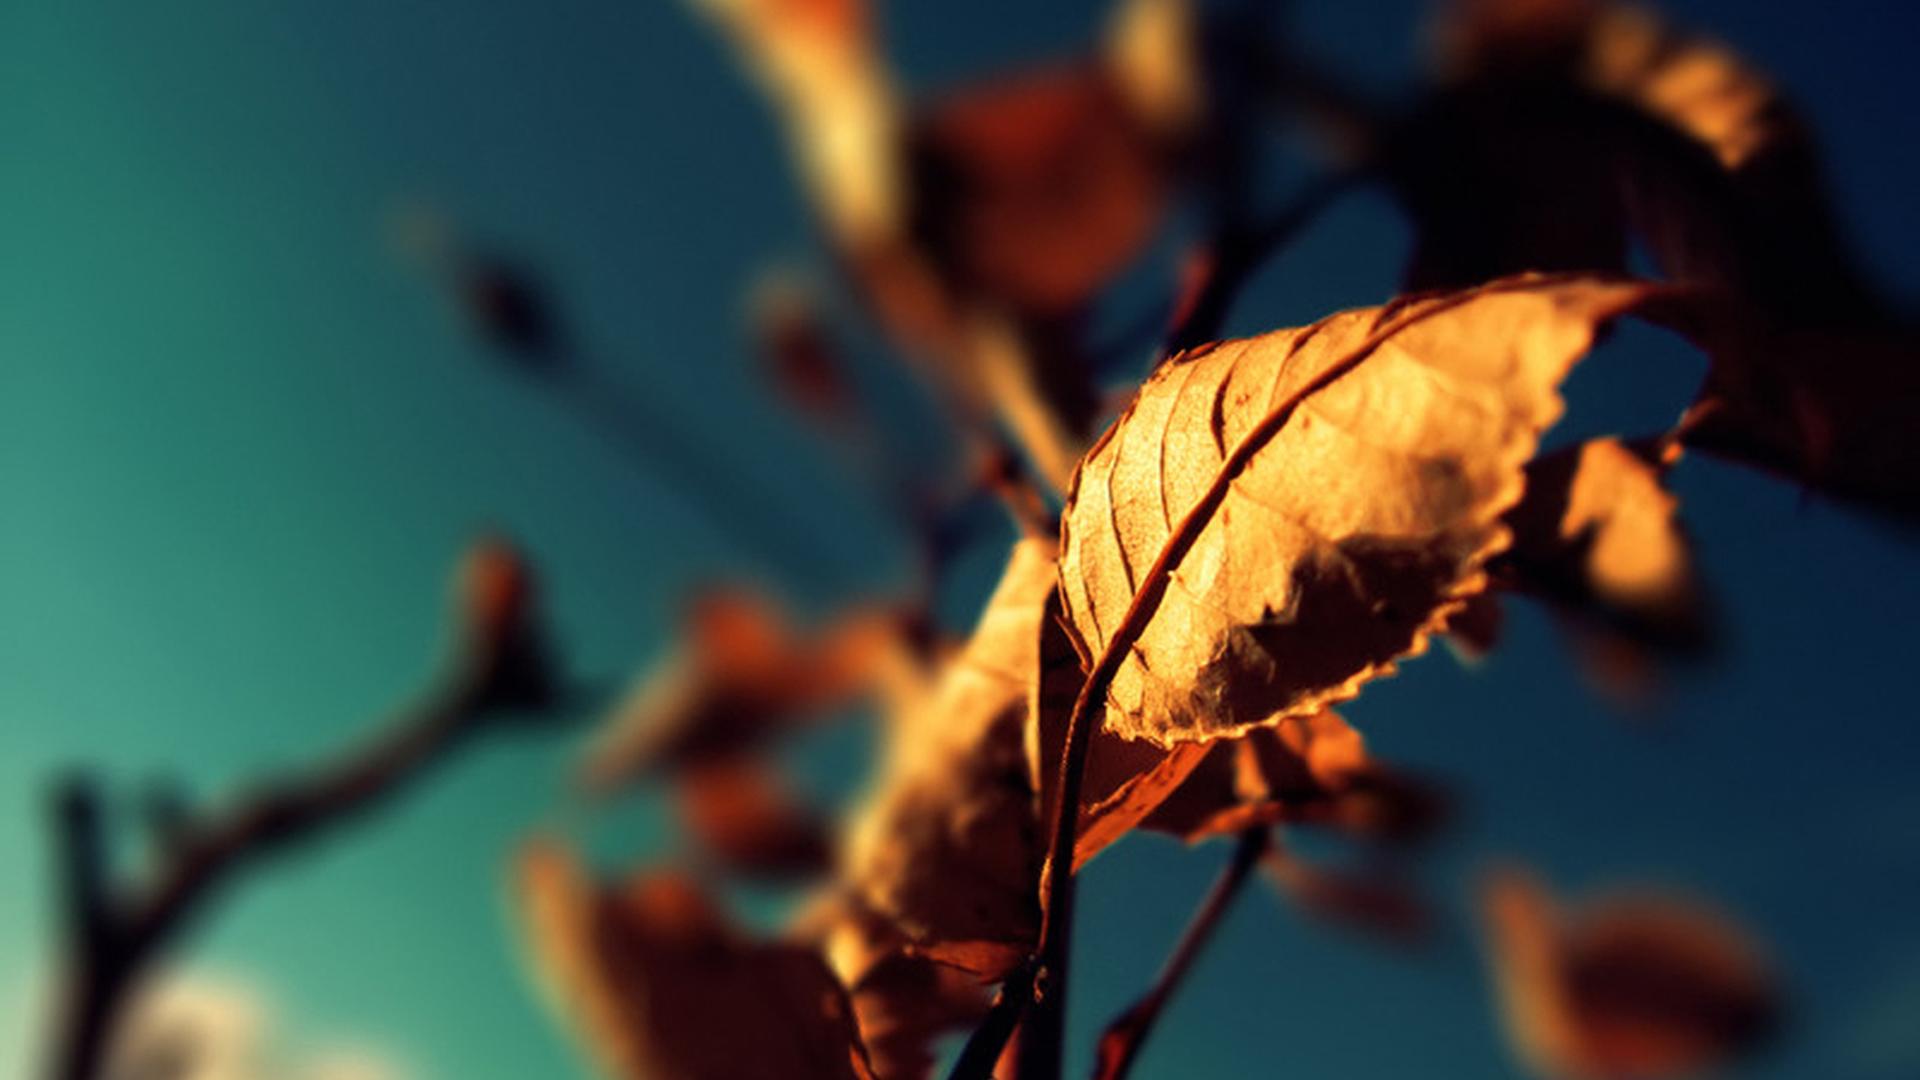 photography 28282